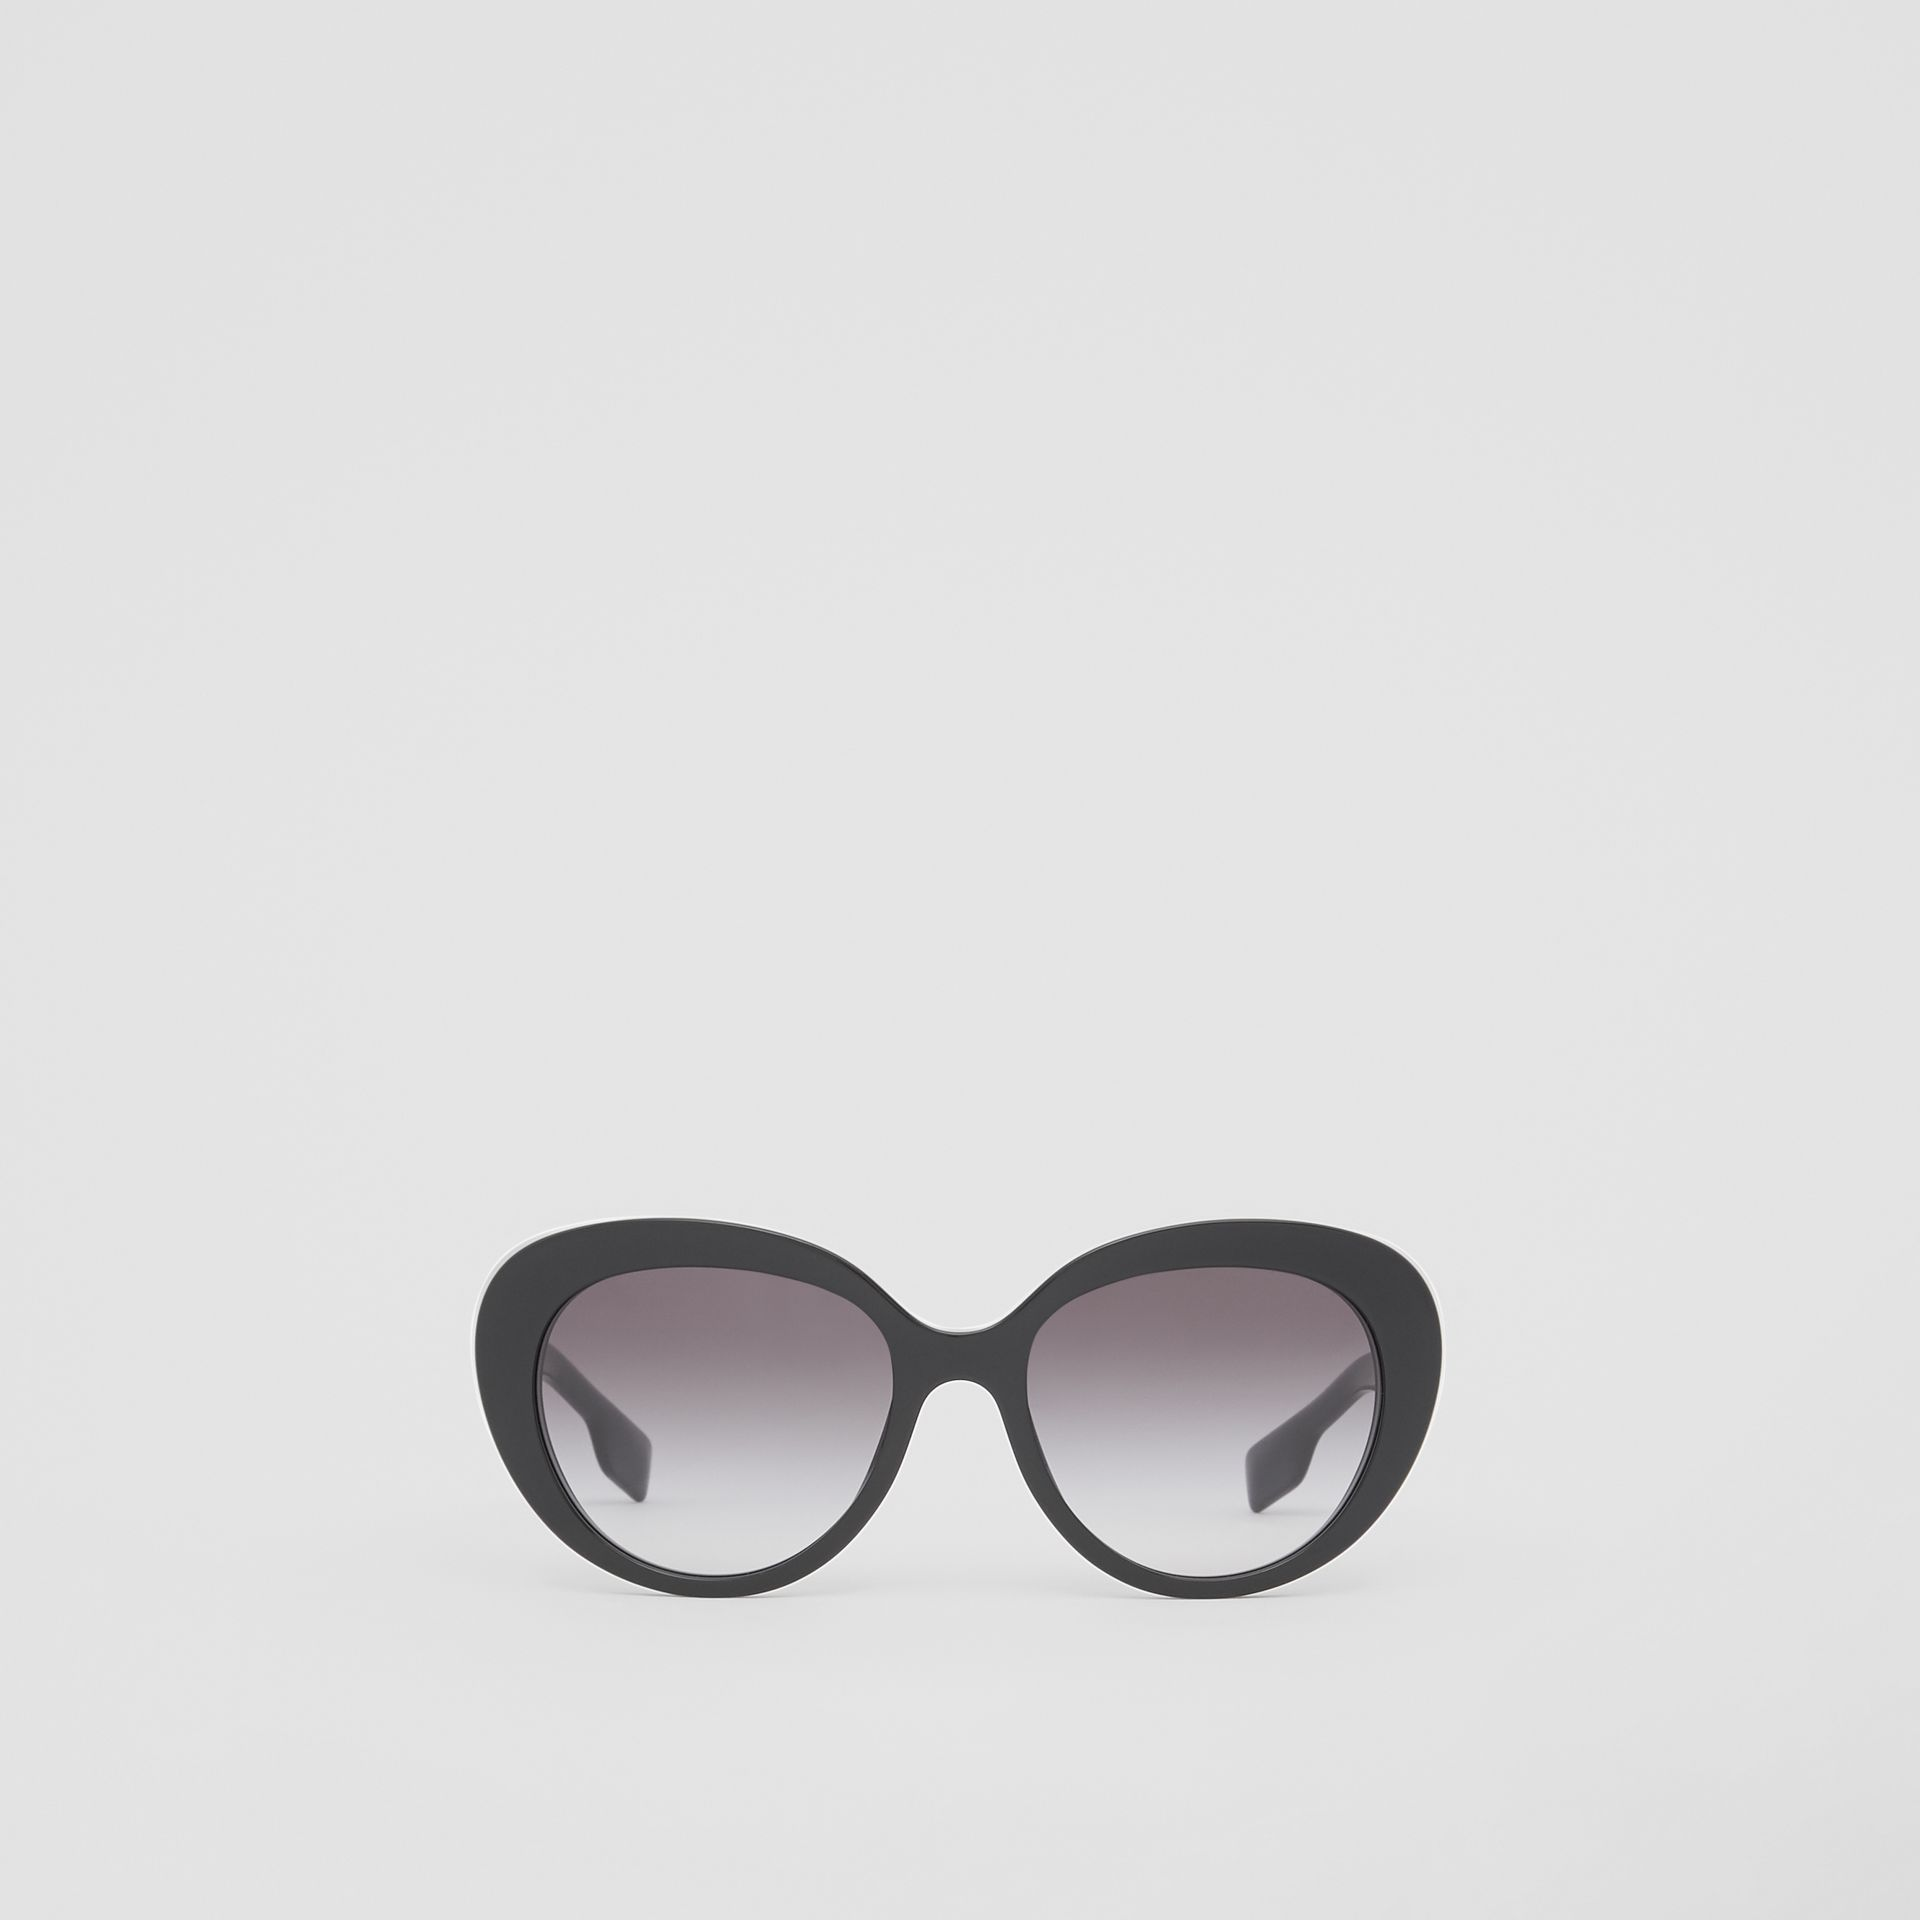 Monogram Motif Cat-eye Frame Sunglasses in Black - Women | Burberry - gallery image 0